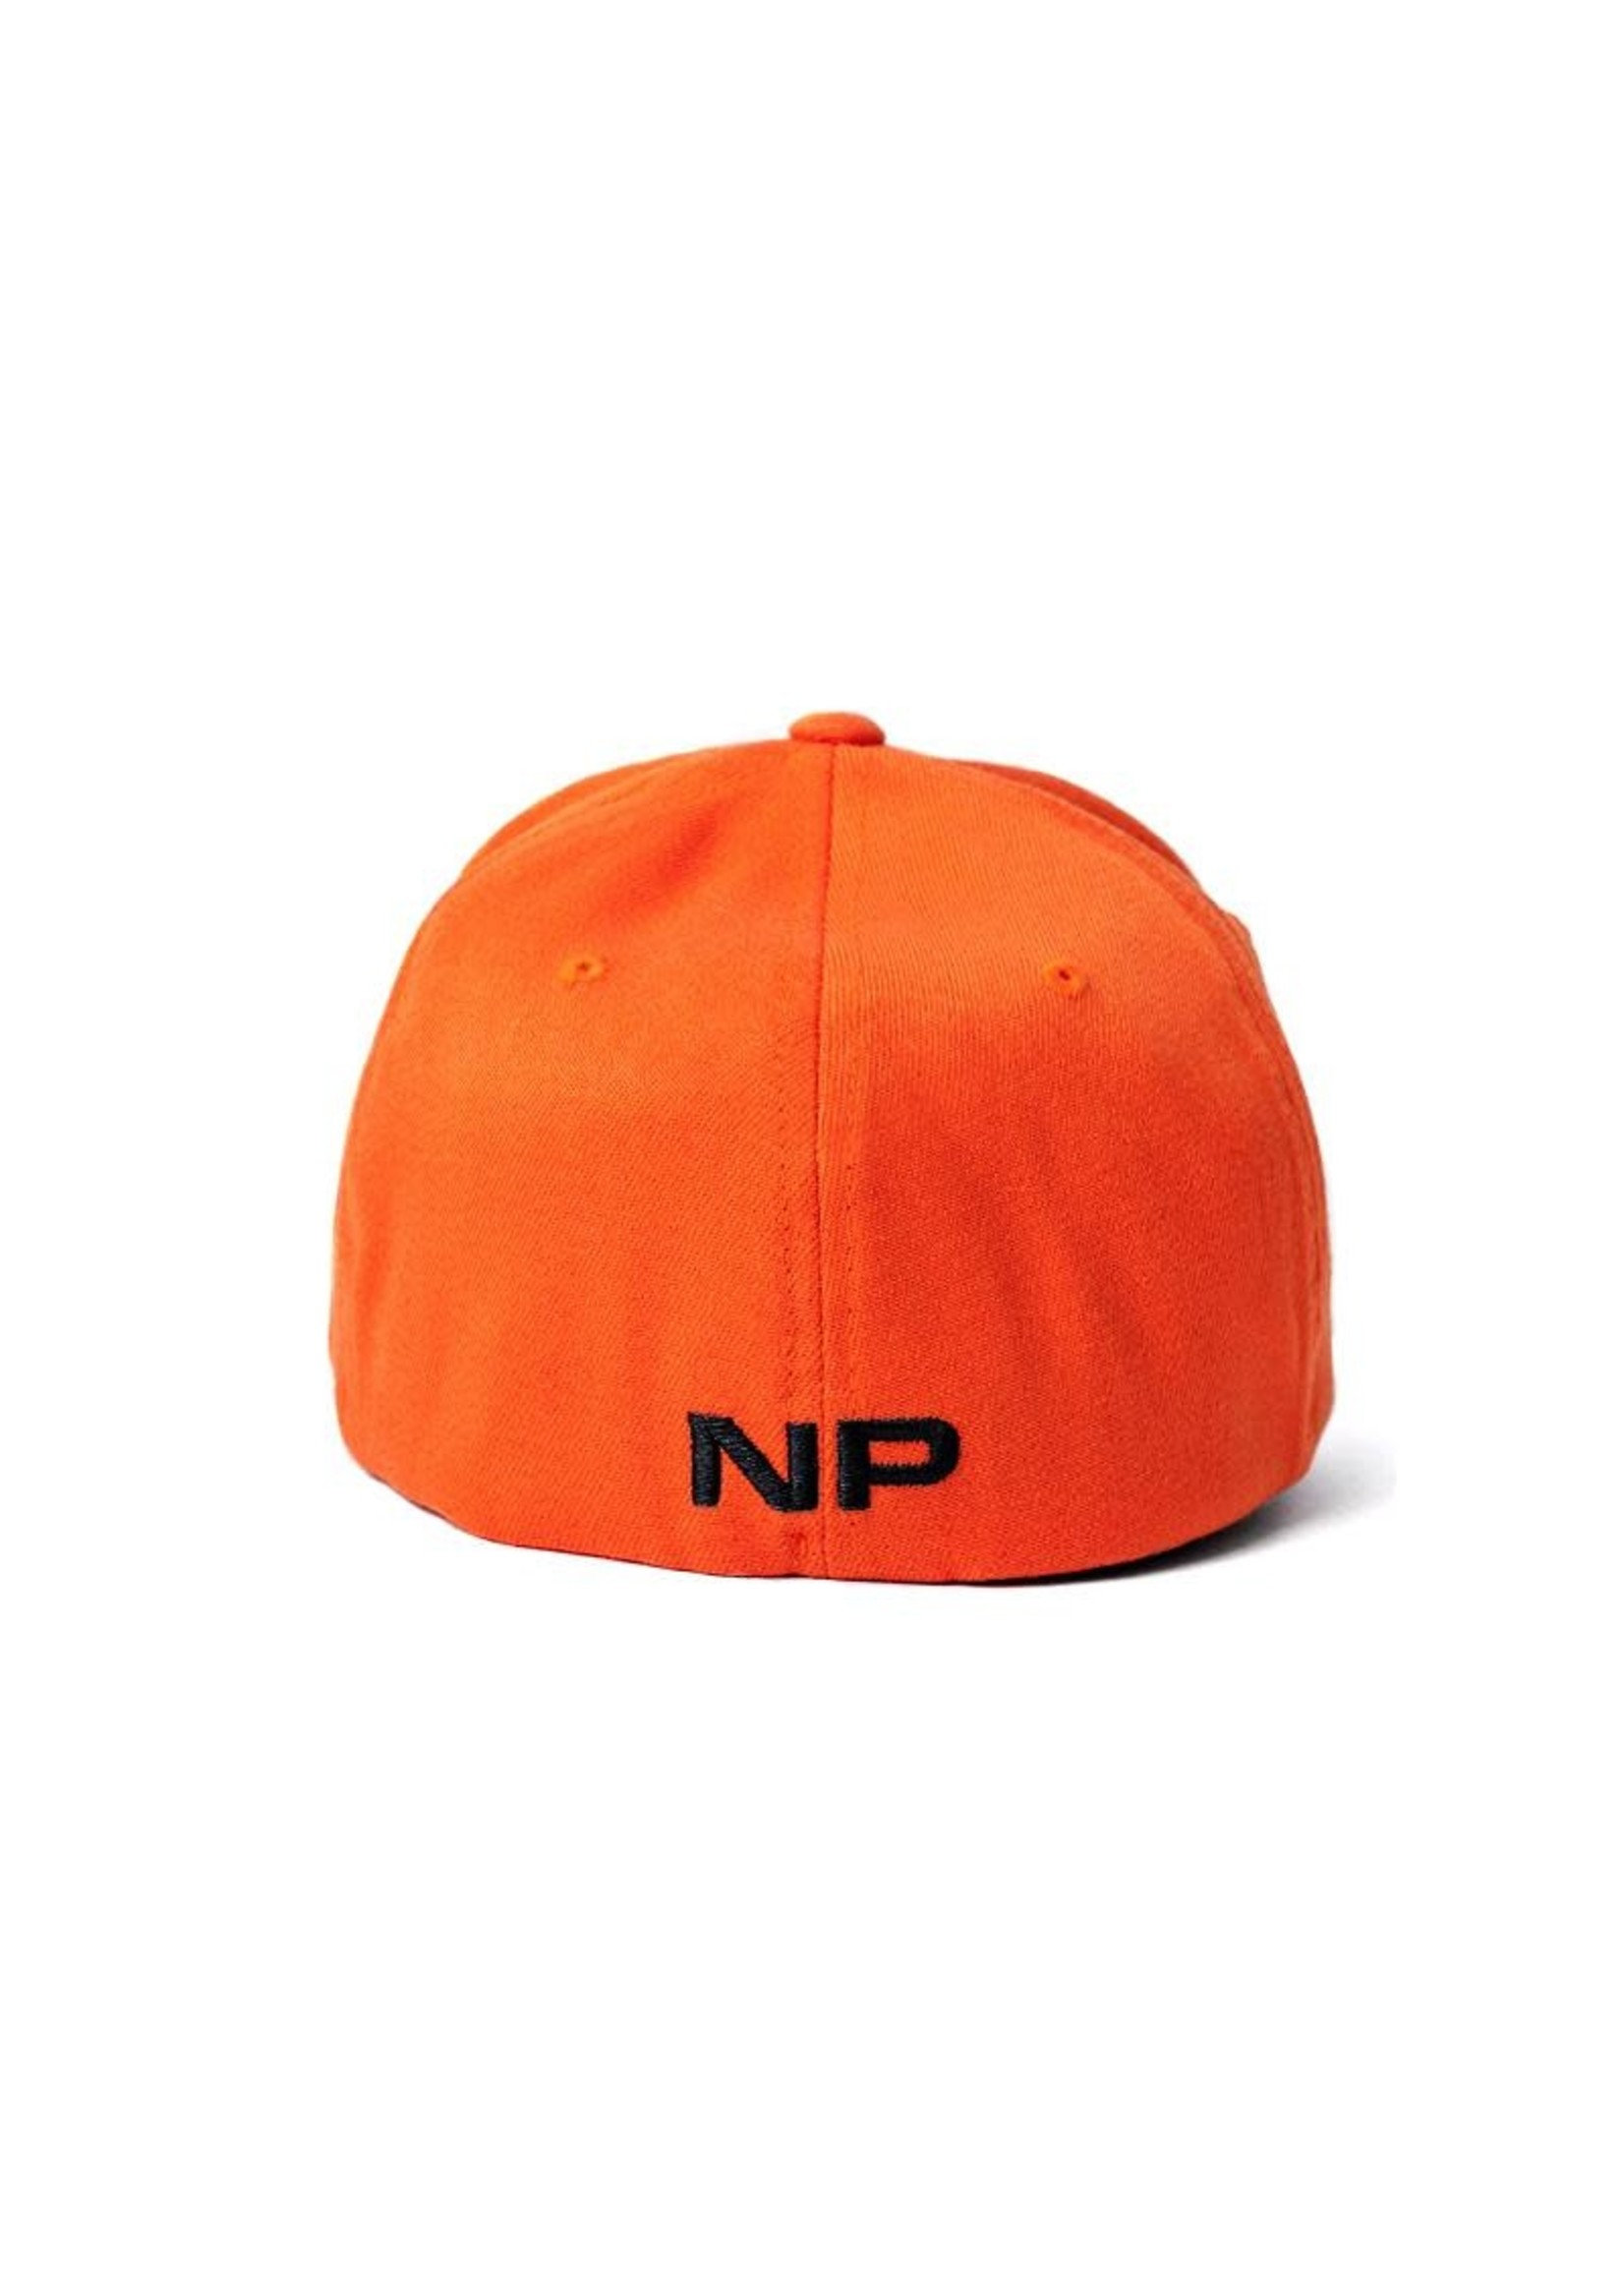 Nasty Pig Nasty Pig Snout Cap